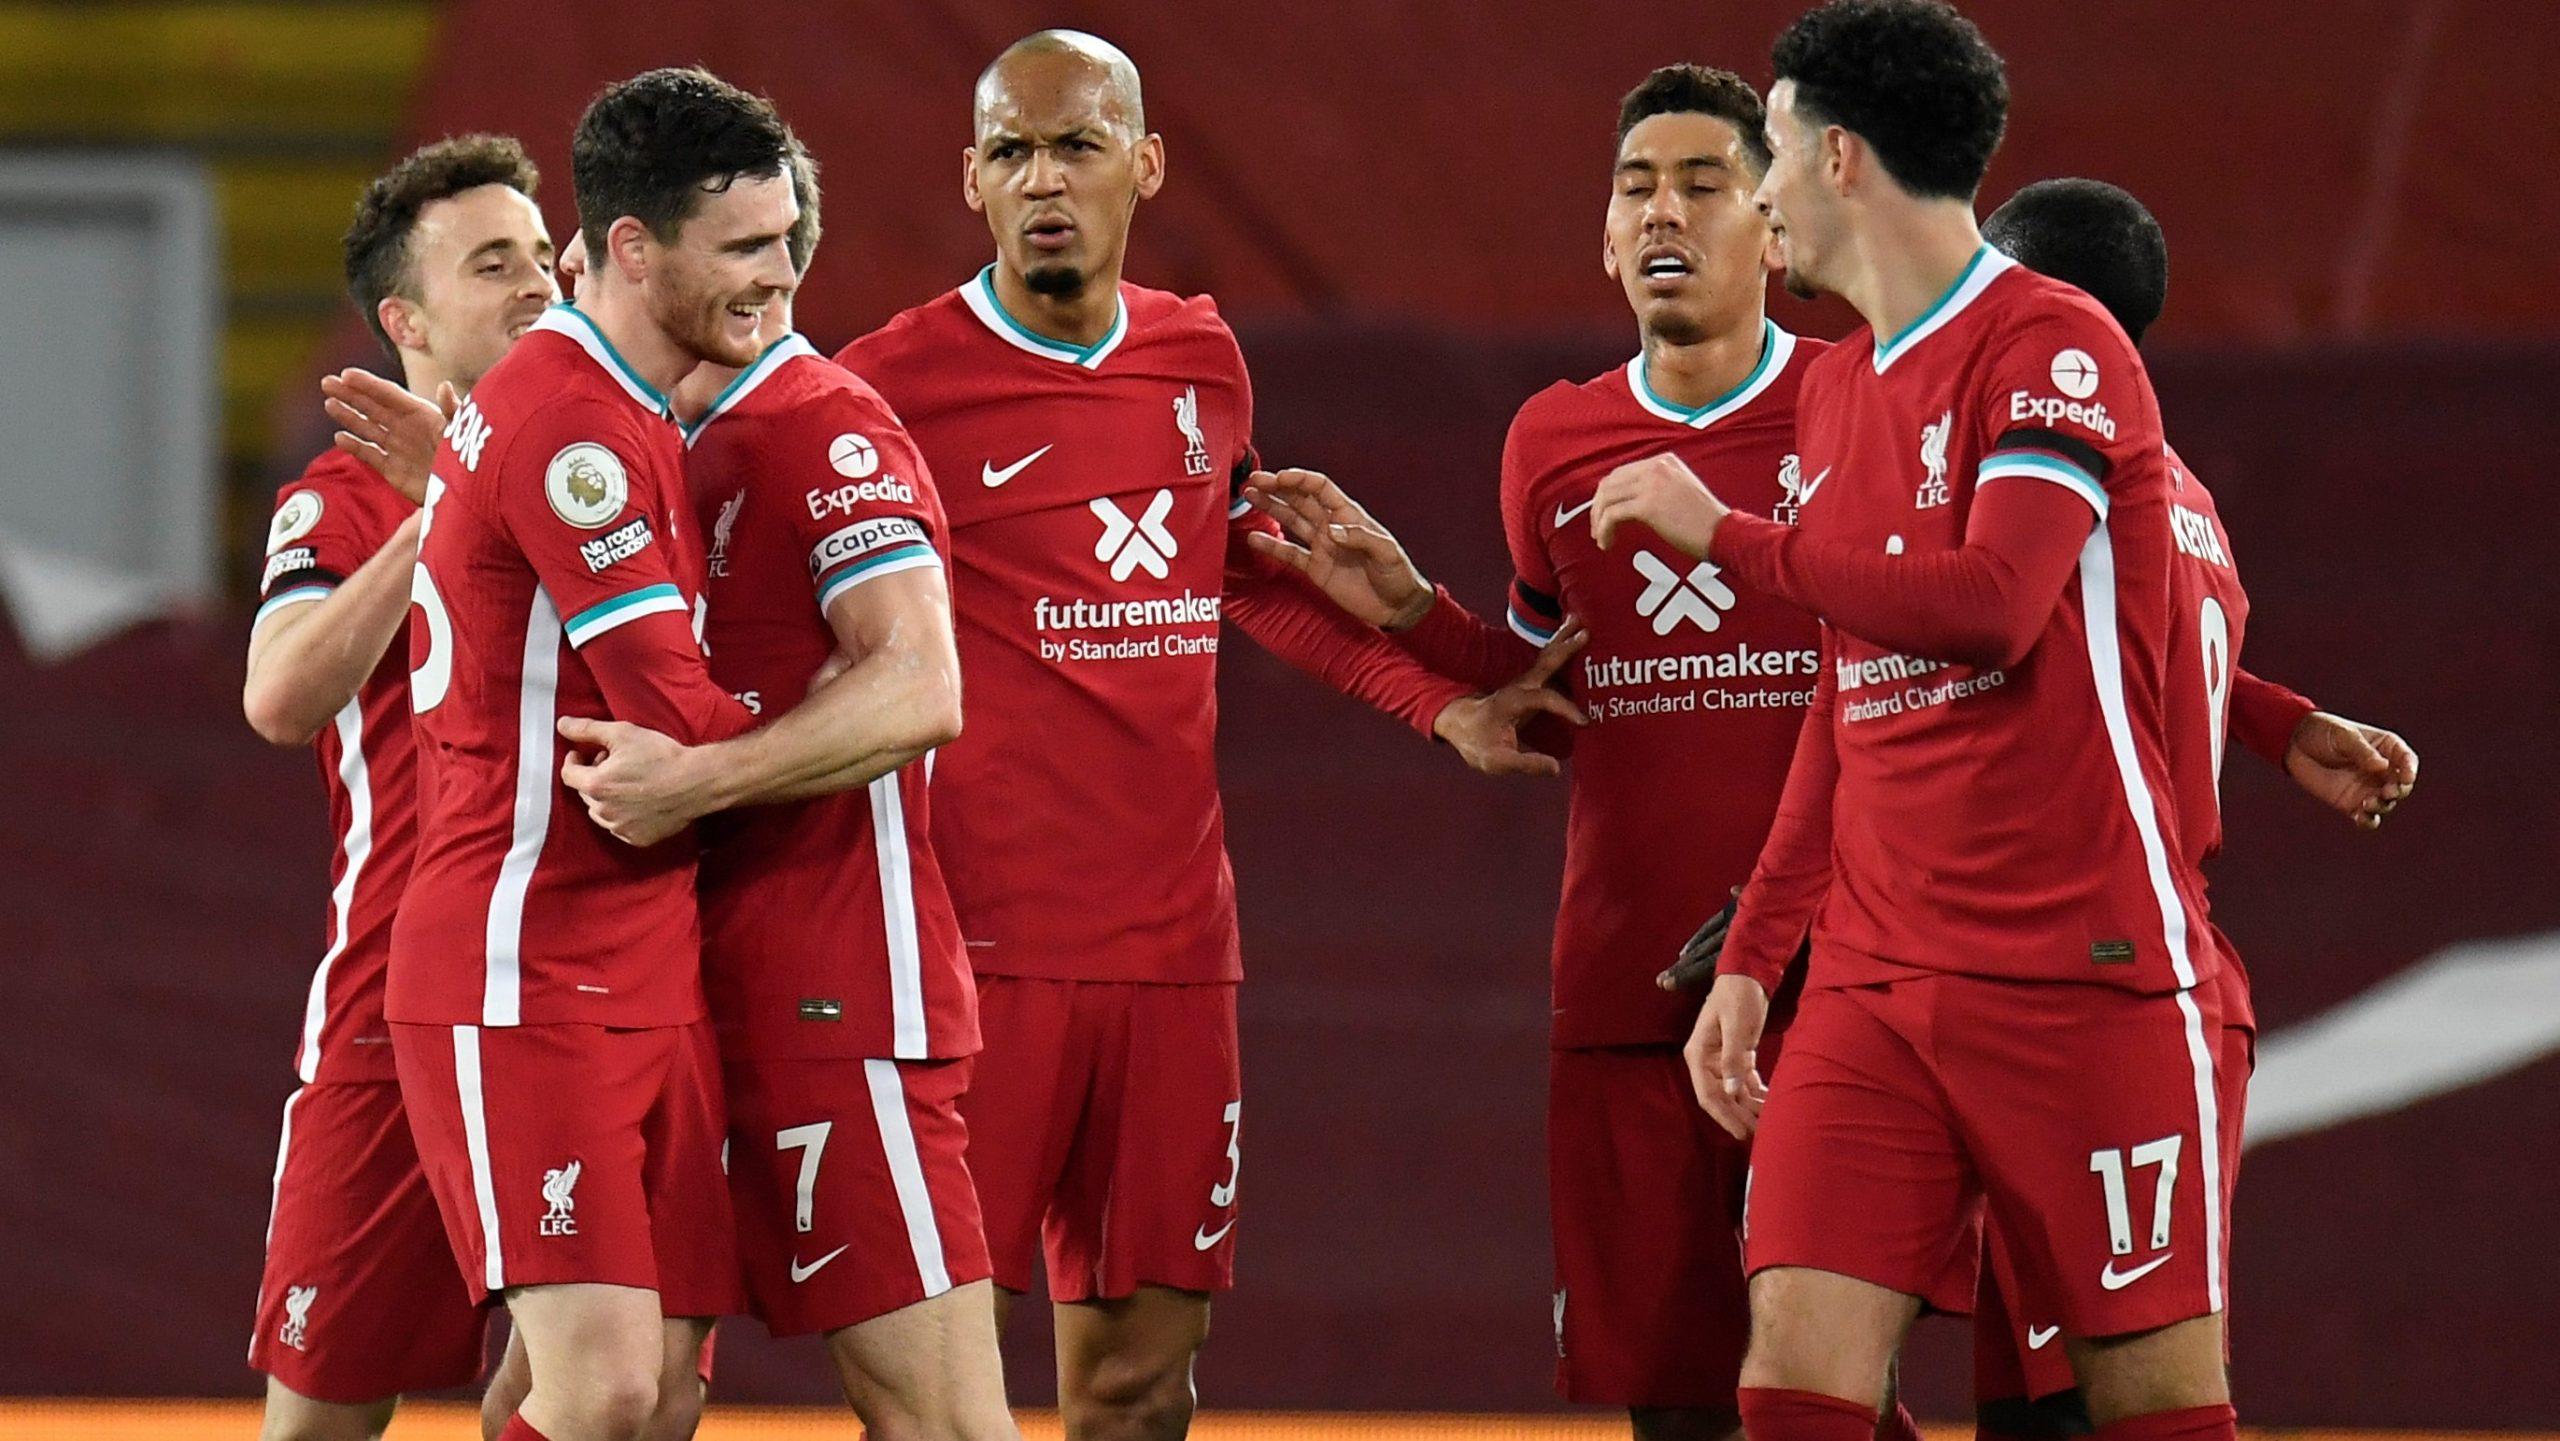 Liverpool savunmada ne yaptı?